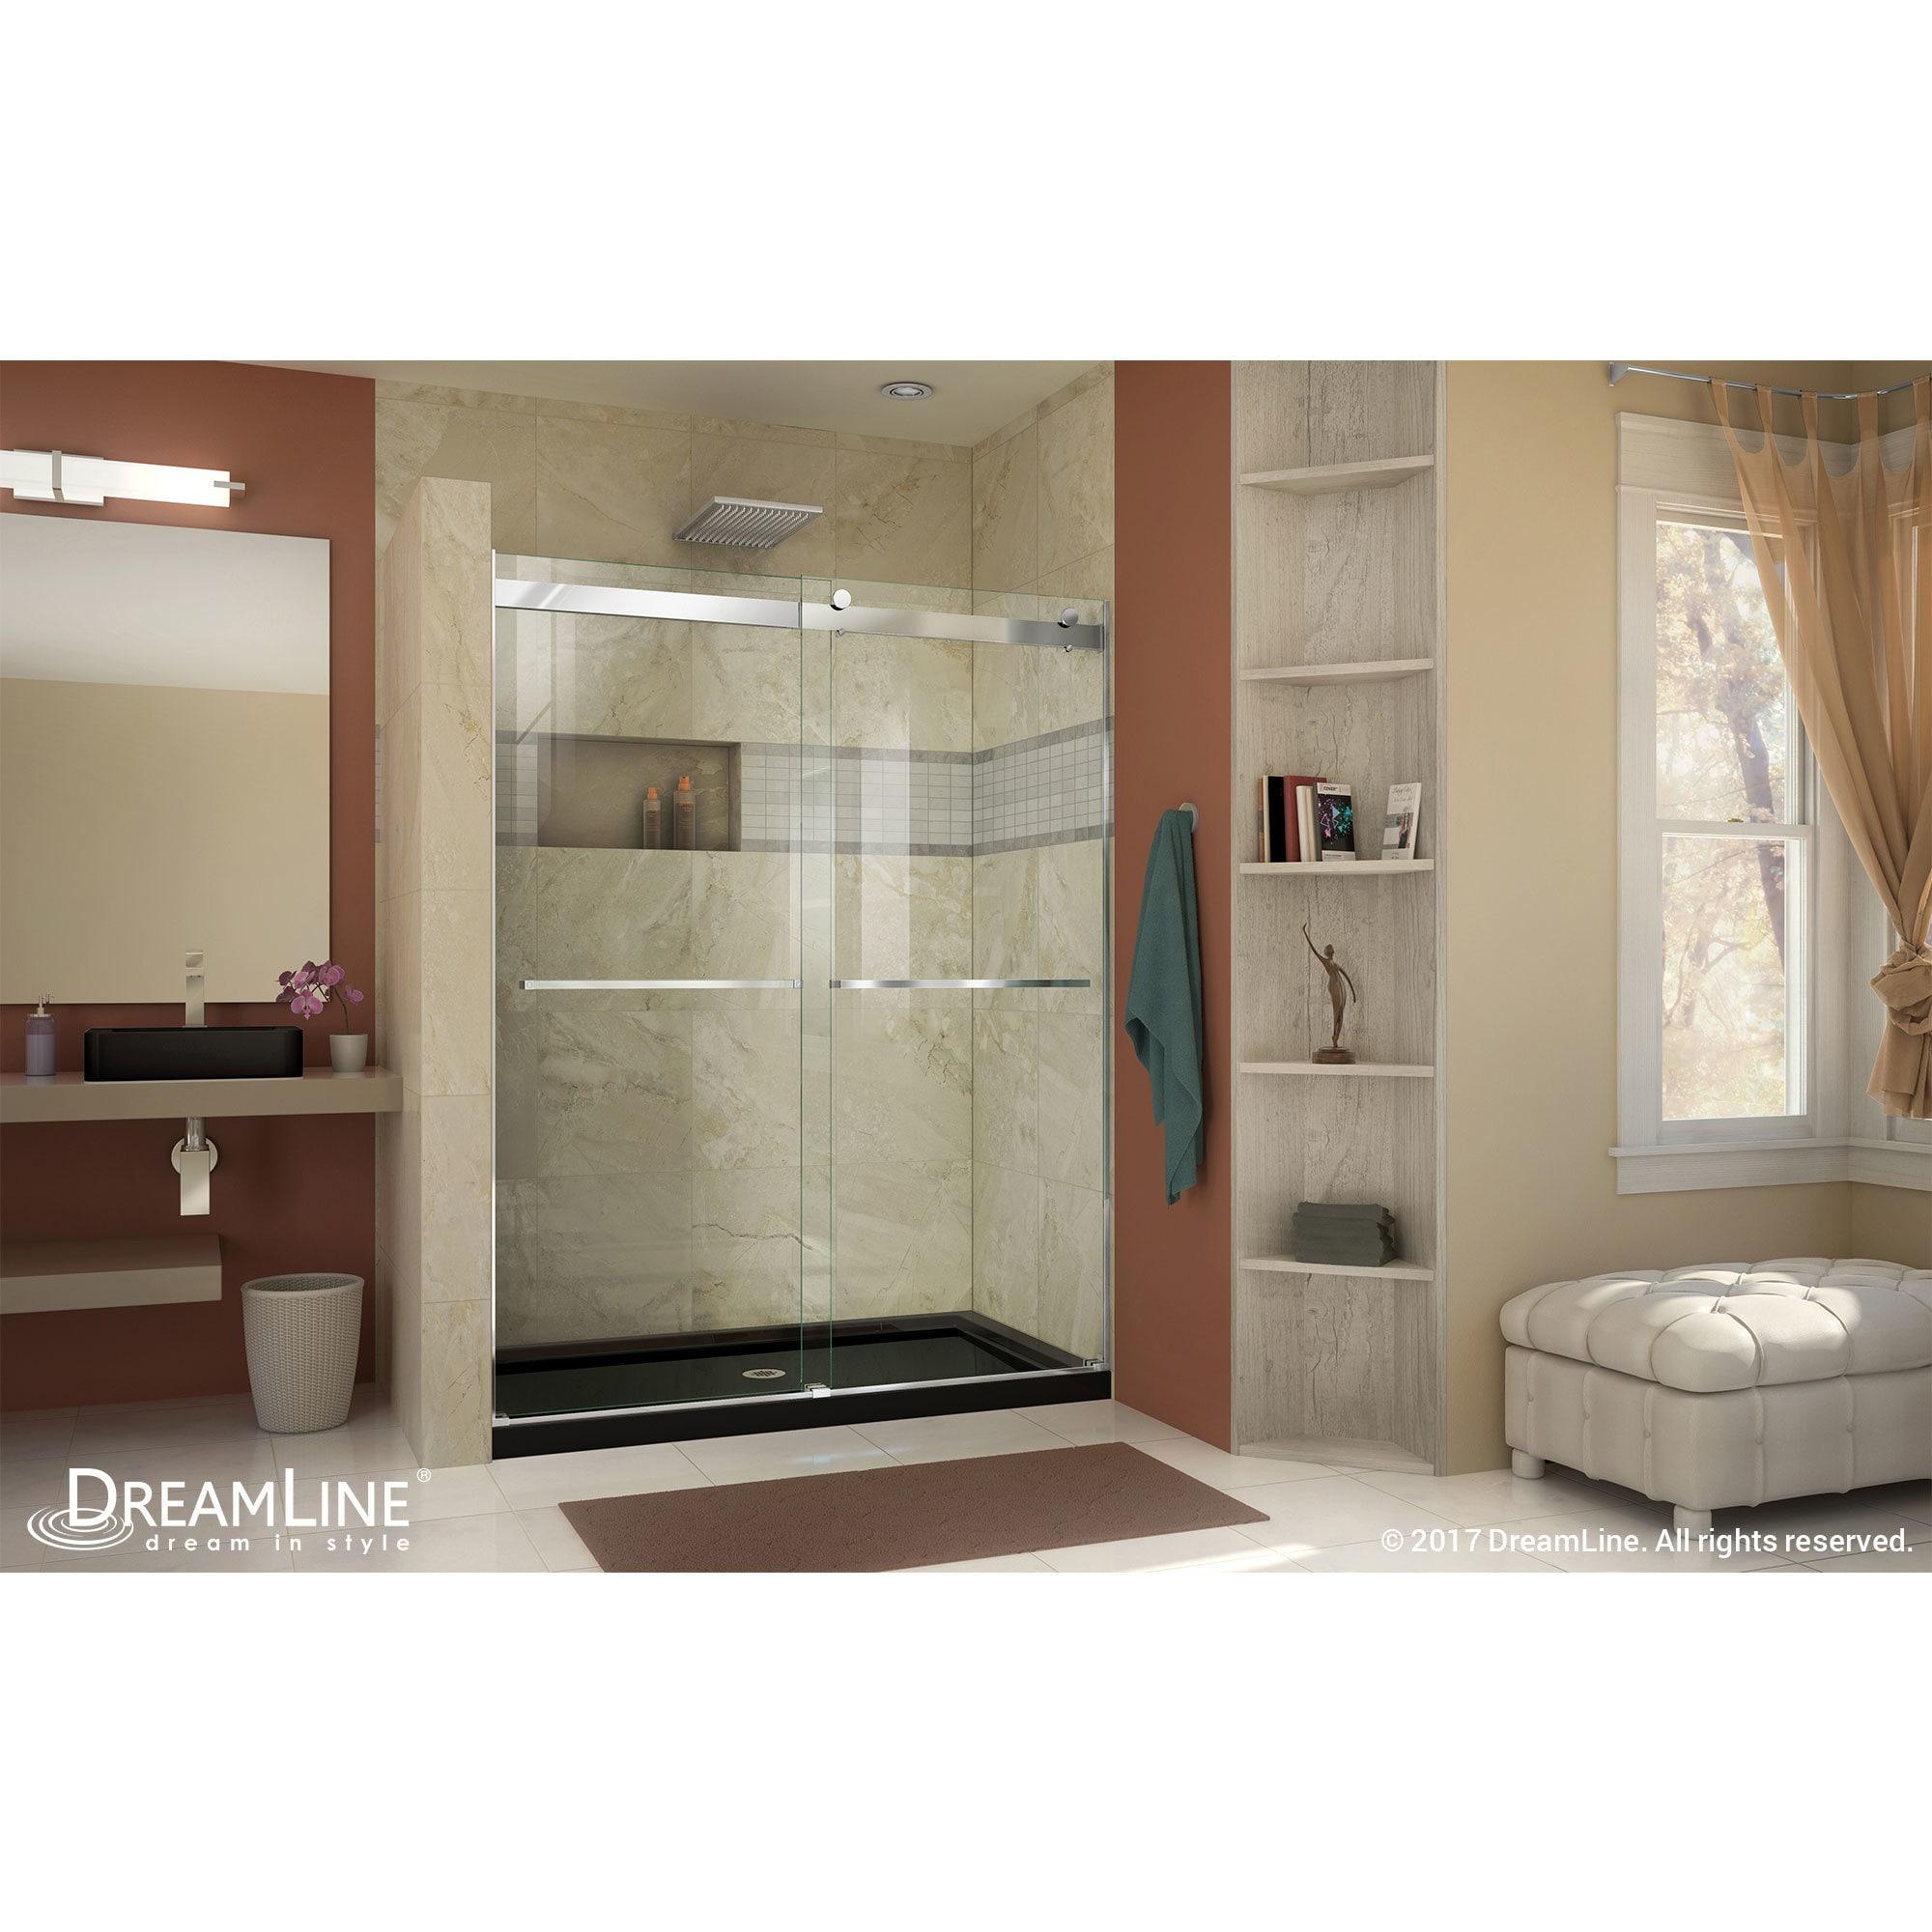 DreamLine Essence 56 to 60 in. Frameless Bypass Shower Door - Free ...